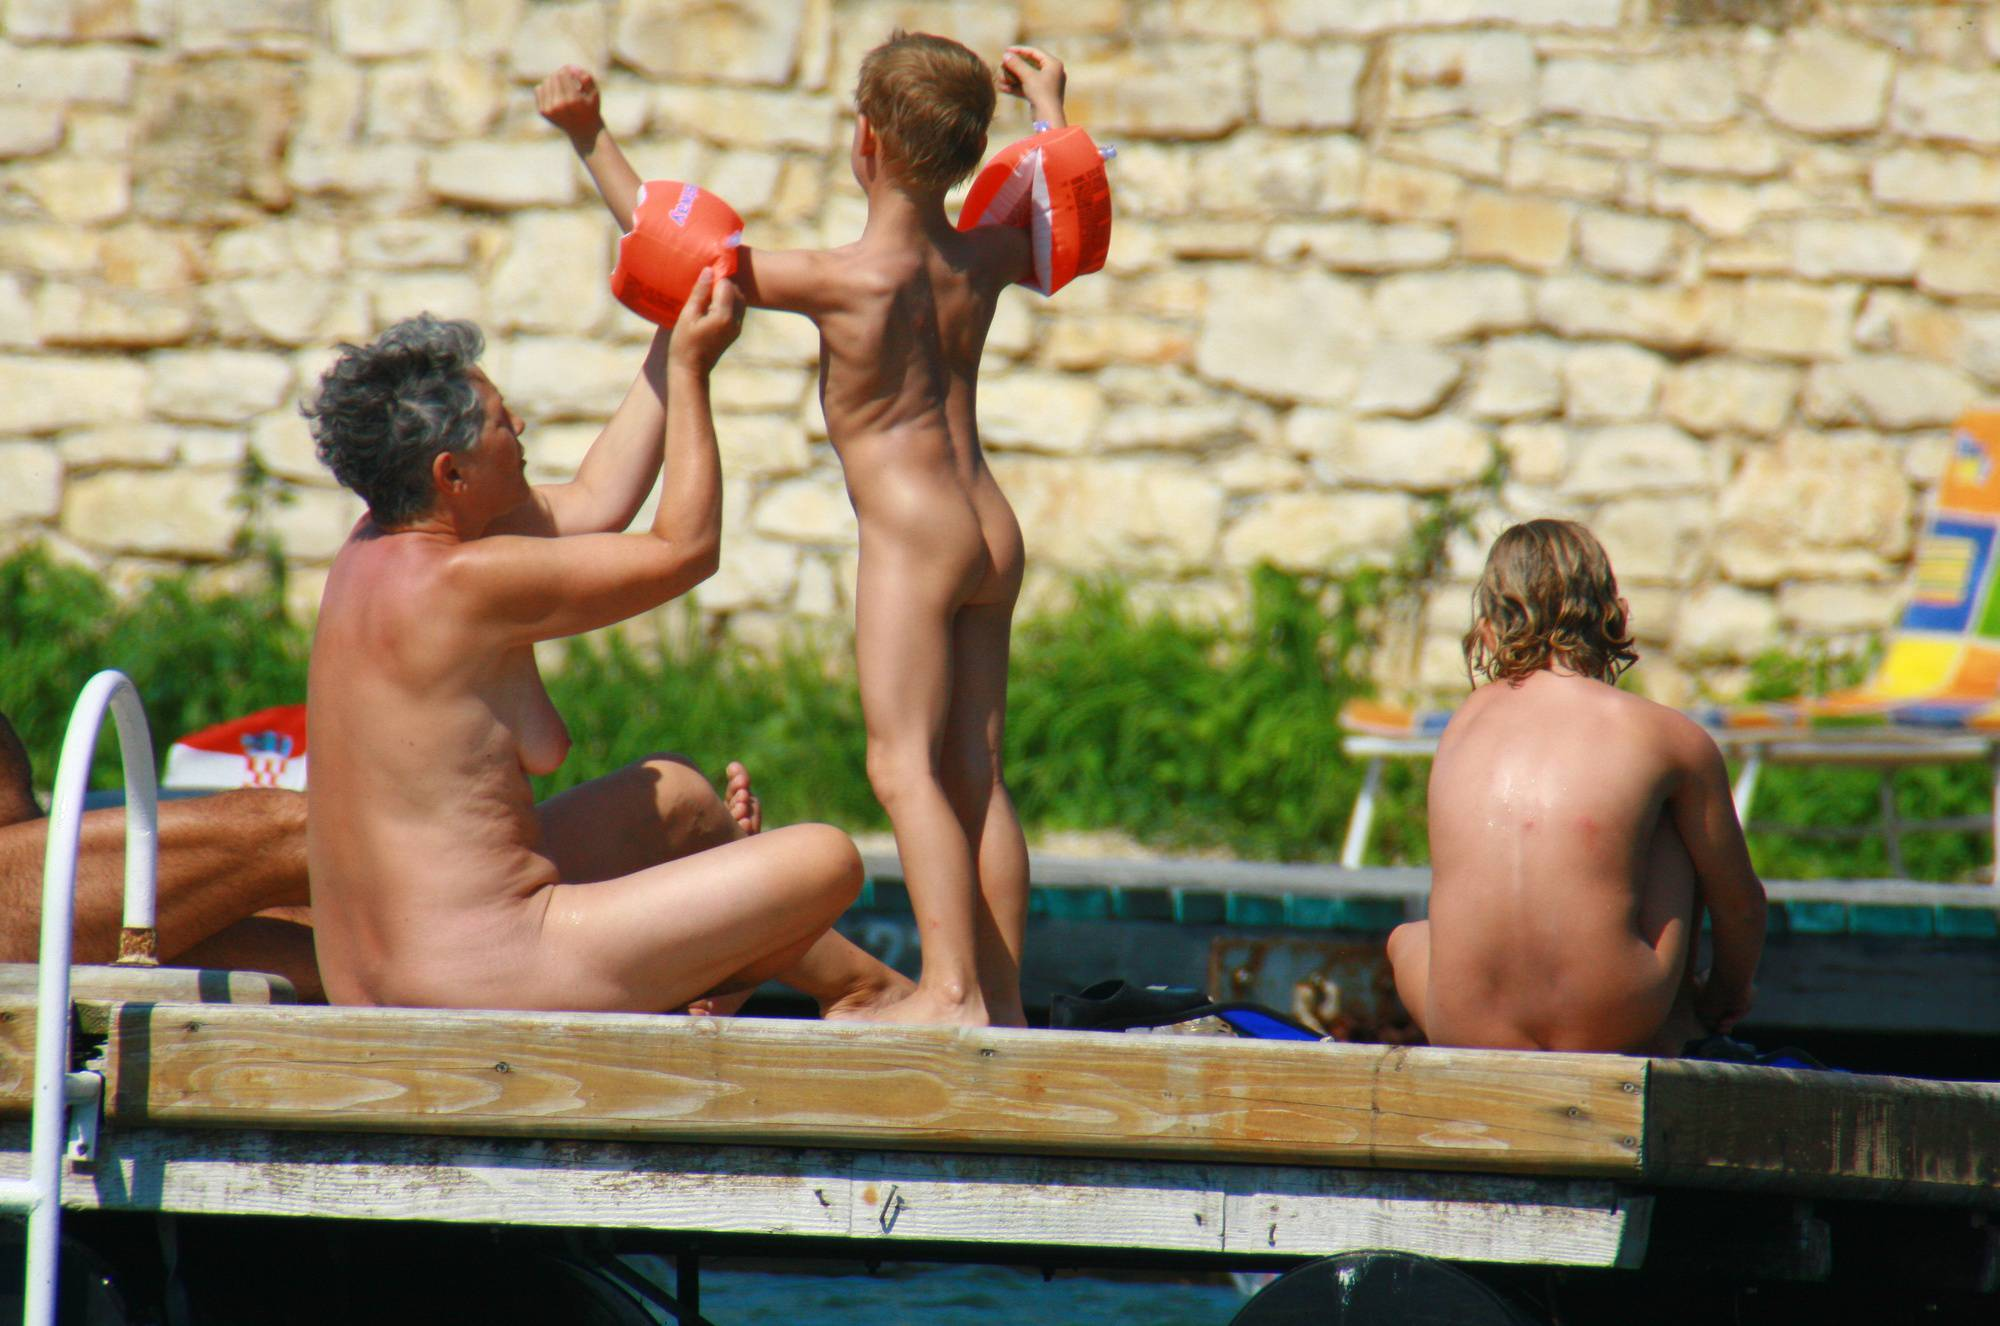 Purenudism Images-Early Nudist Member Day - 2